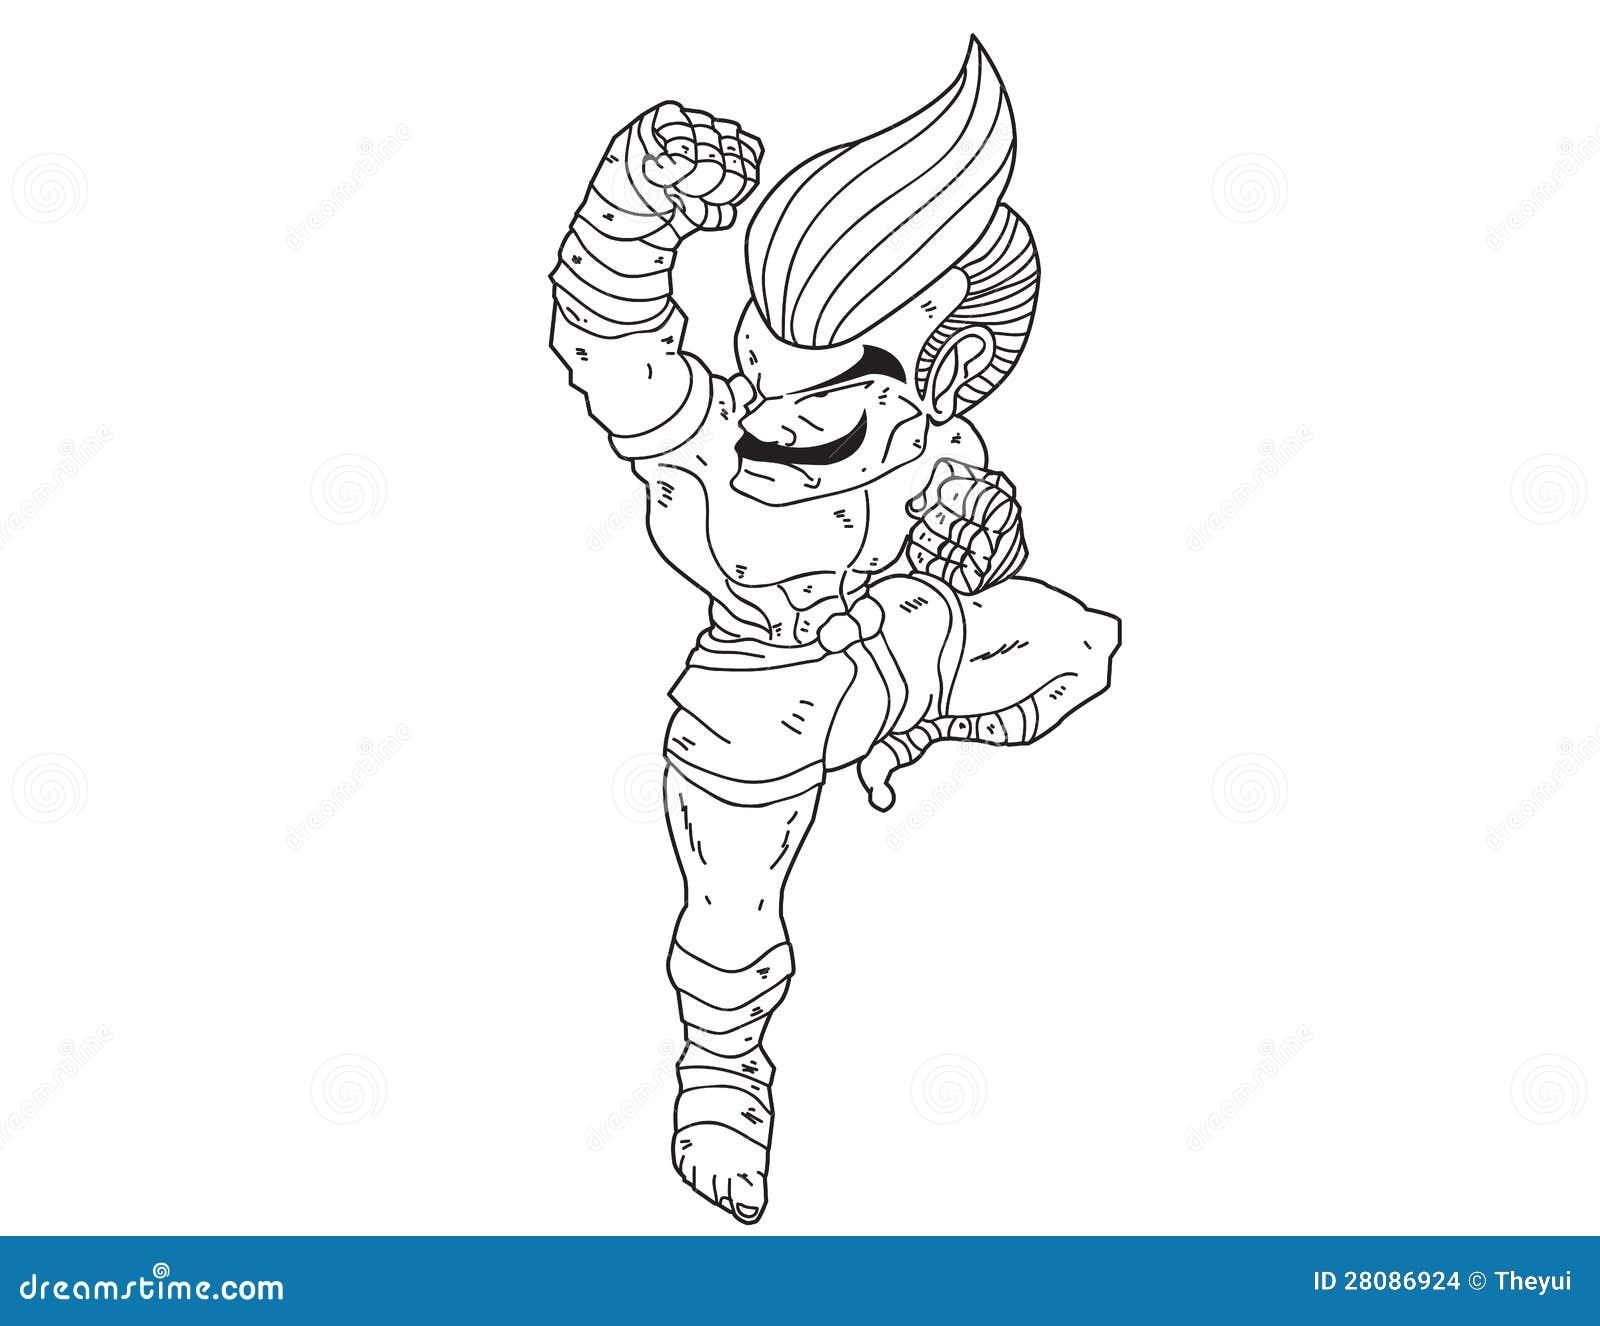 泰拳boran : 字符动画片10